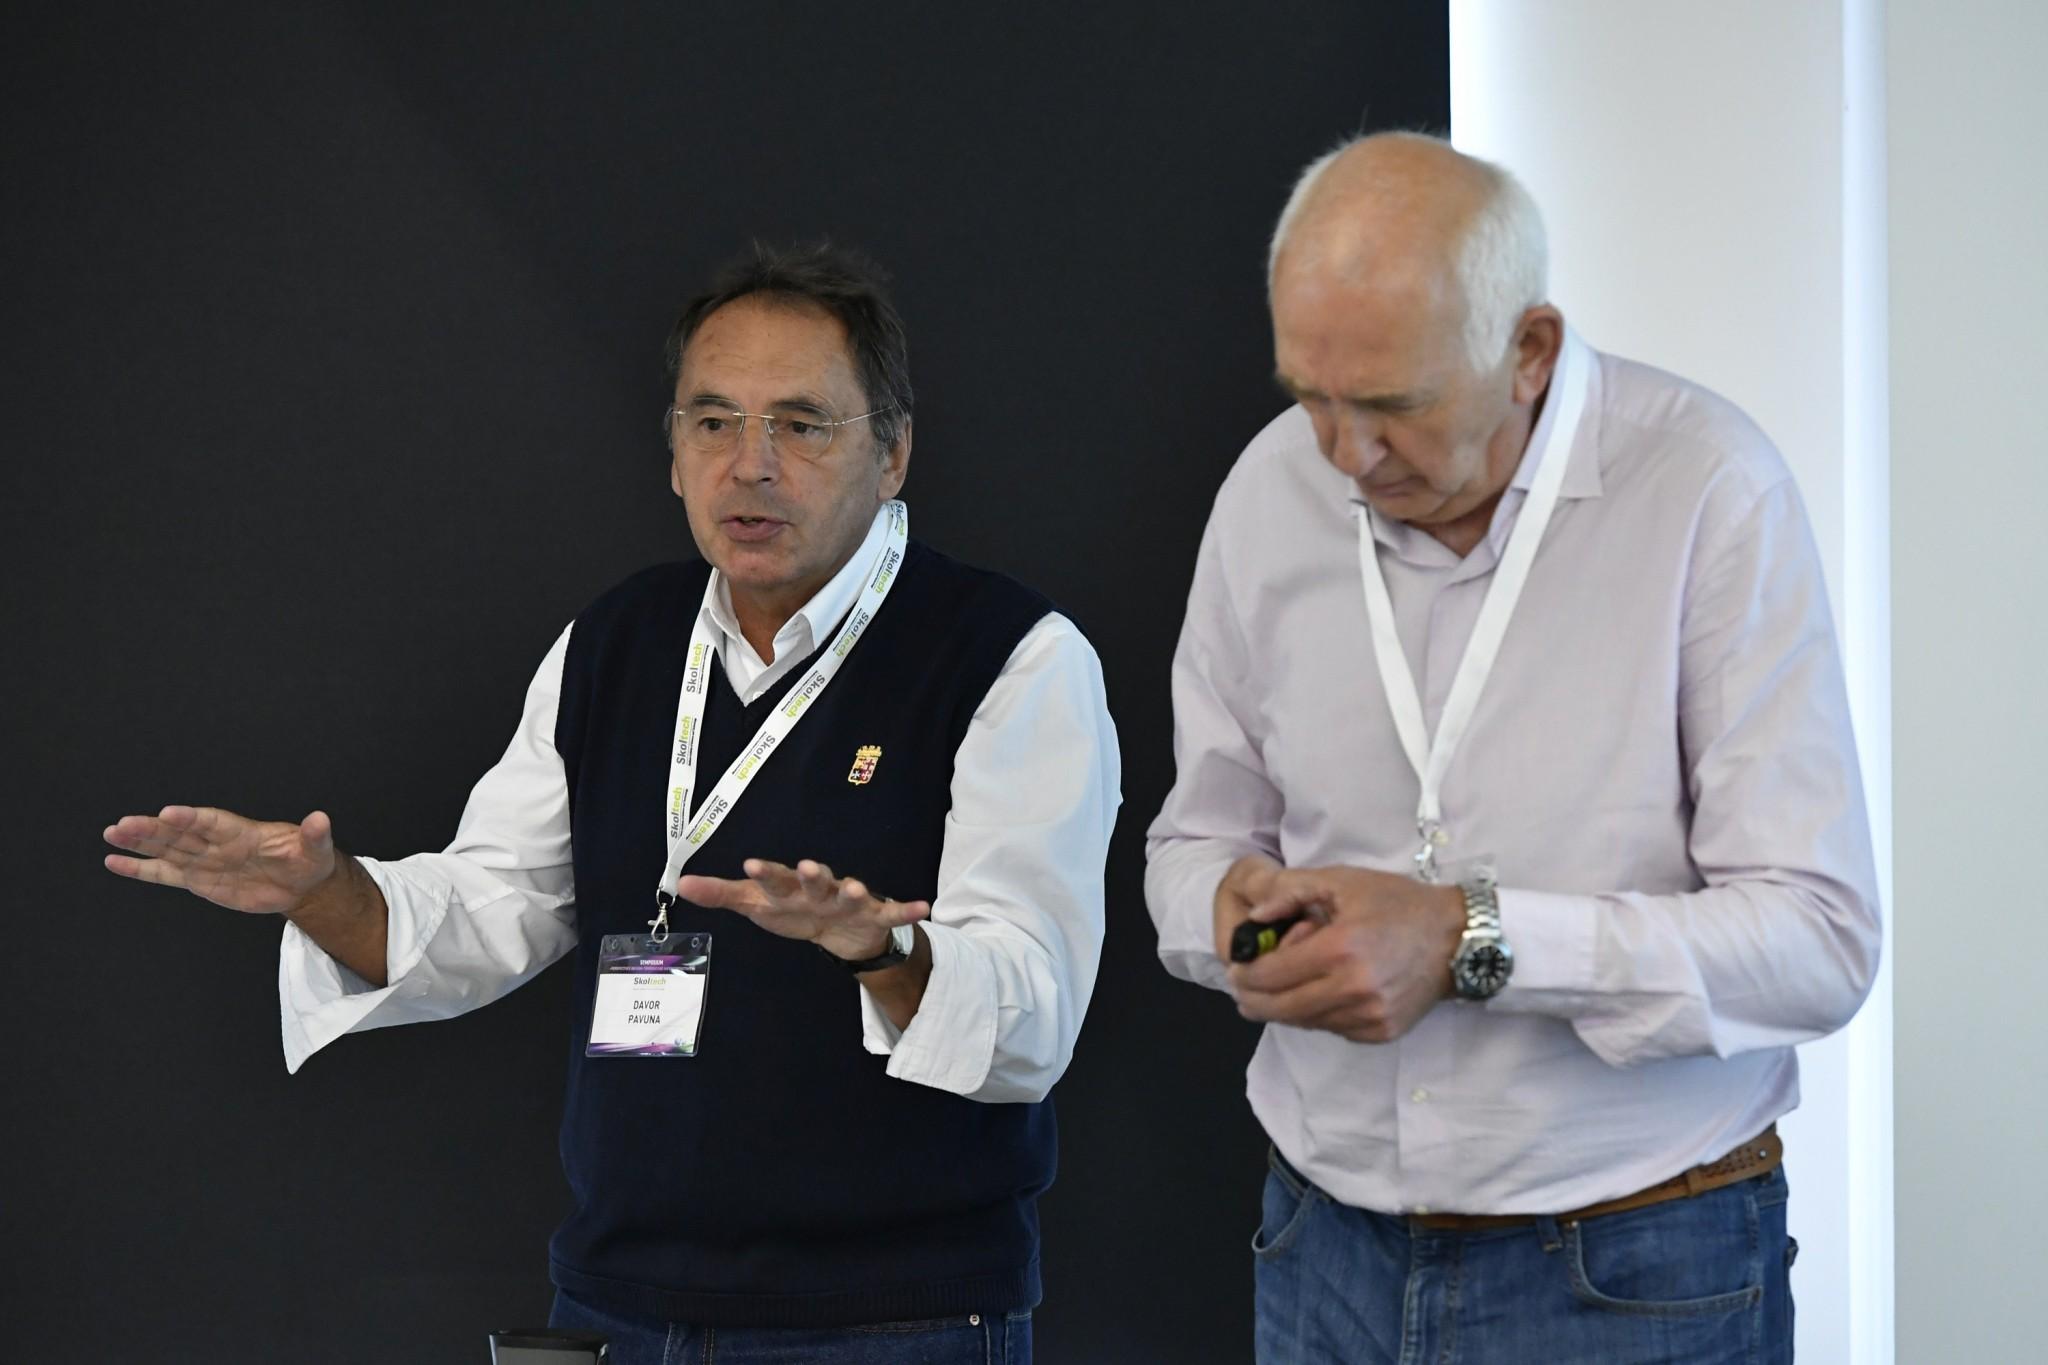 École polytechnique fédérale de Lausanne Professor Davor Pavuna (left), alongside  Professor Sergey Ovchinnikov of the Russian Academy of Sciences. Photo: Skoltech.